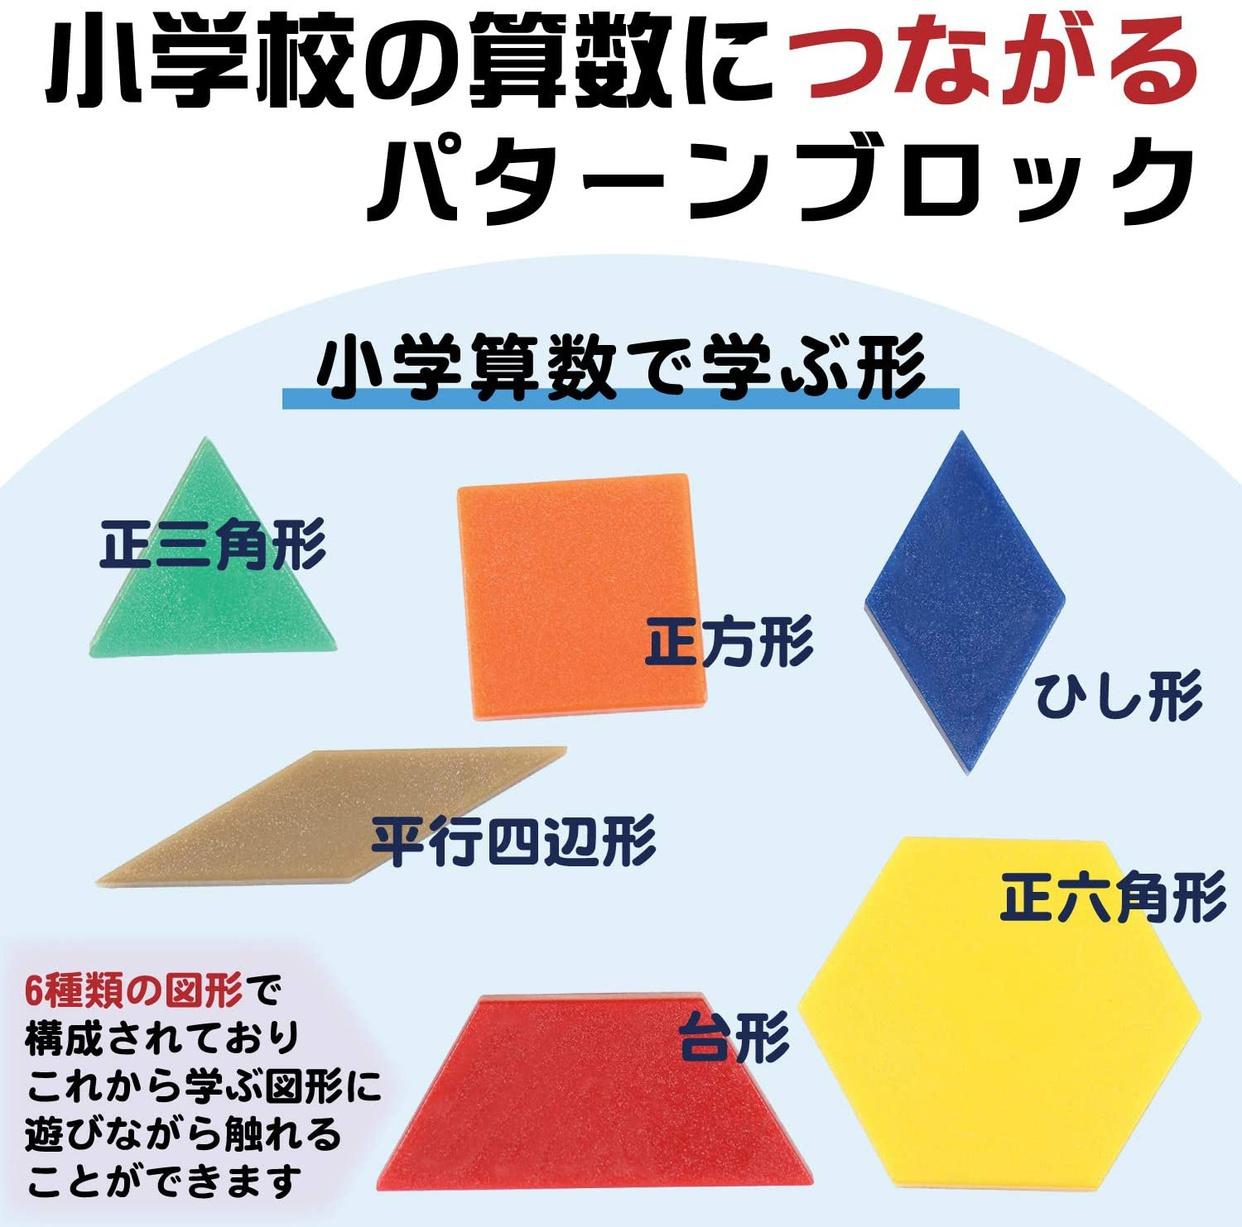 Learning Resources(ラーニングリソーシズ) パターンブロック ミニセットの商品画像4